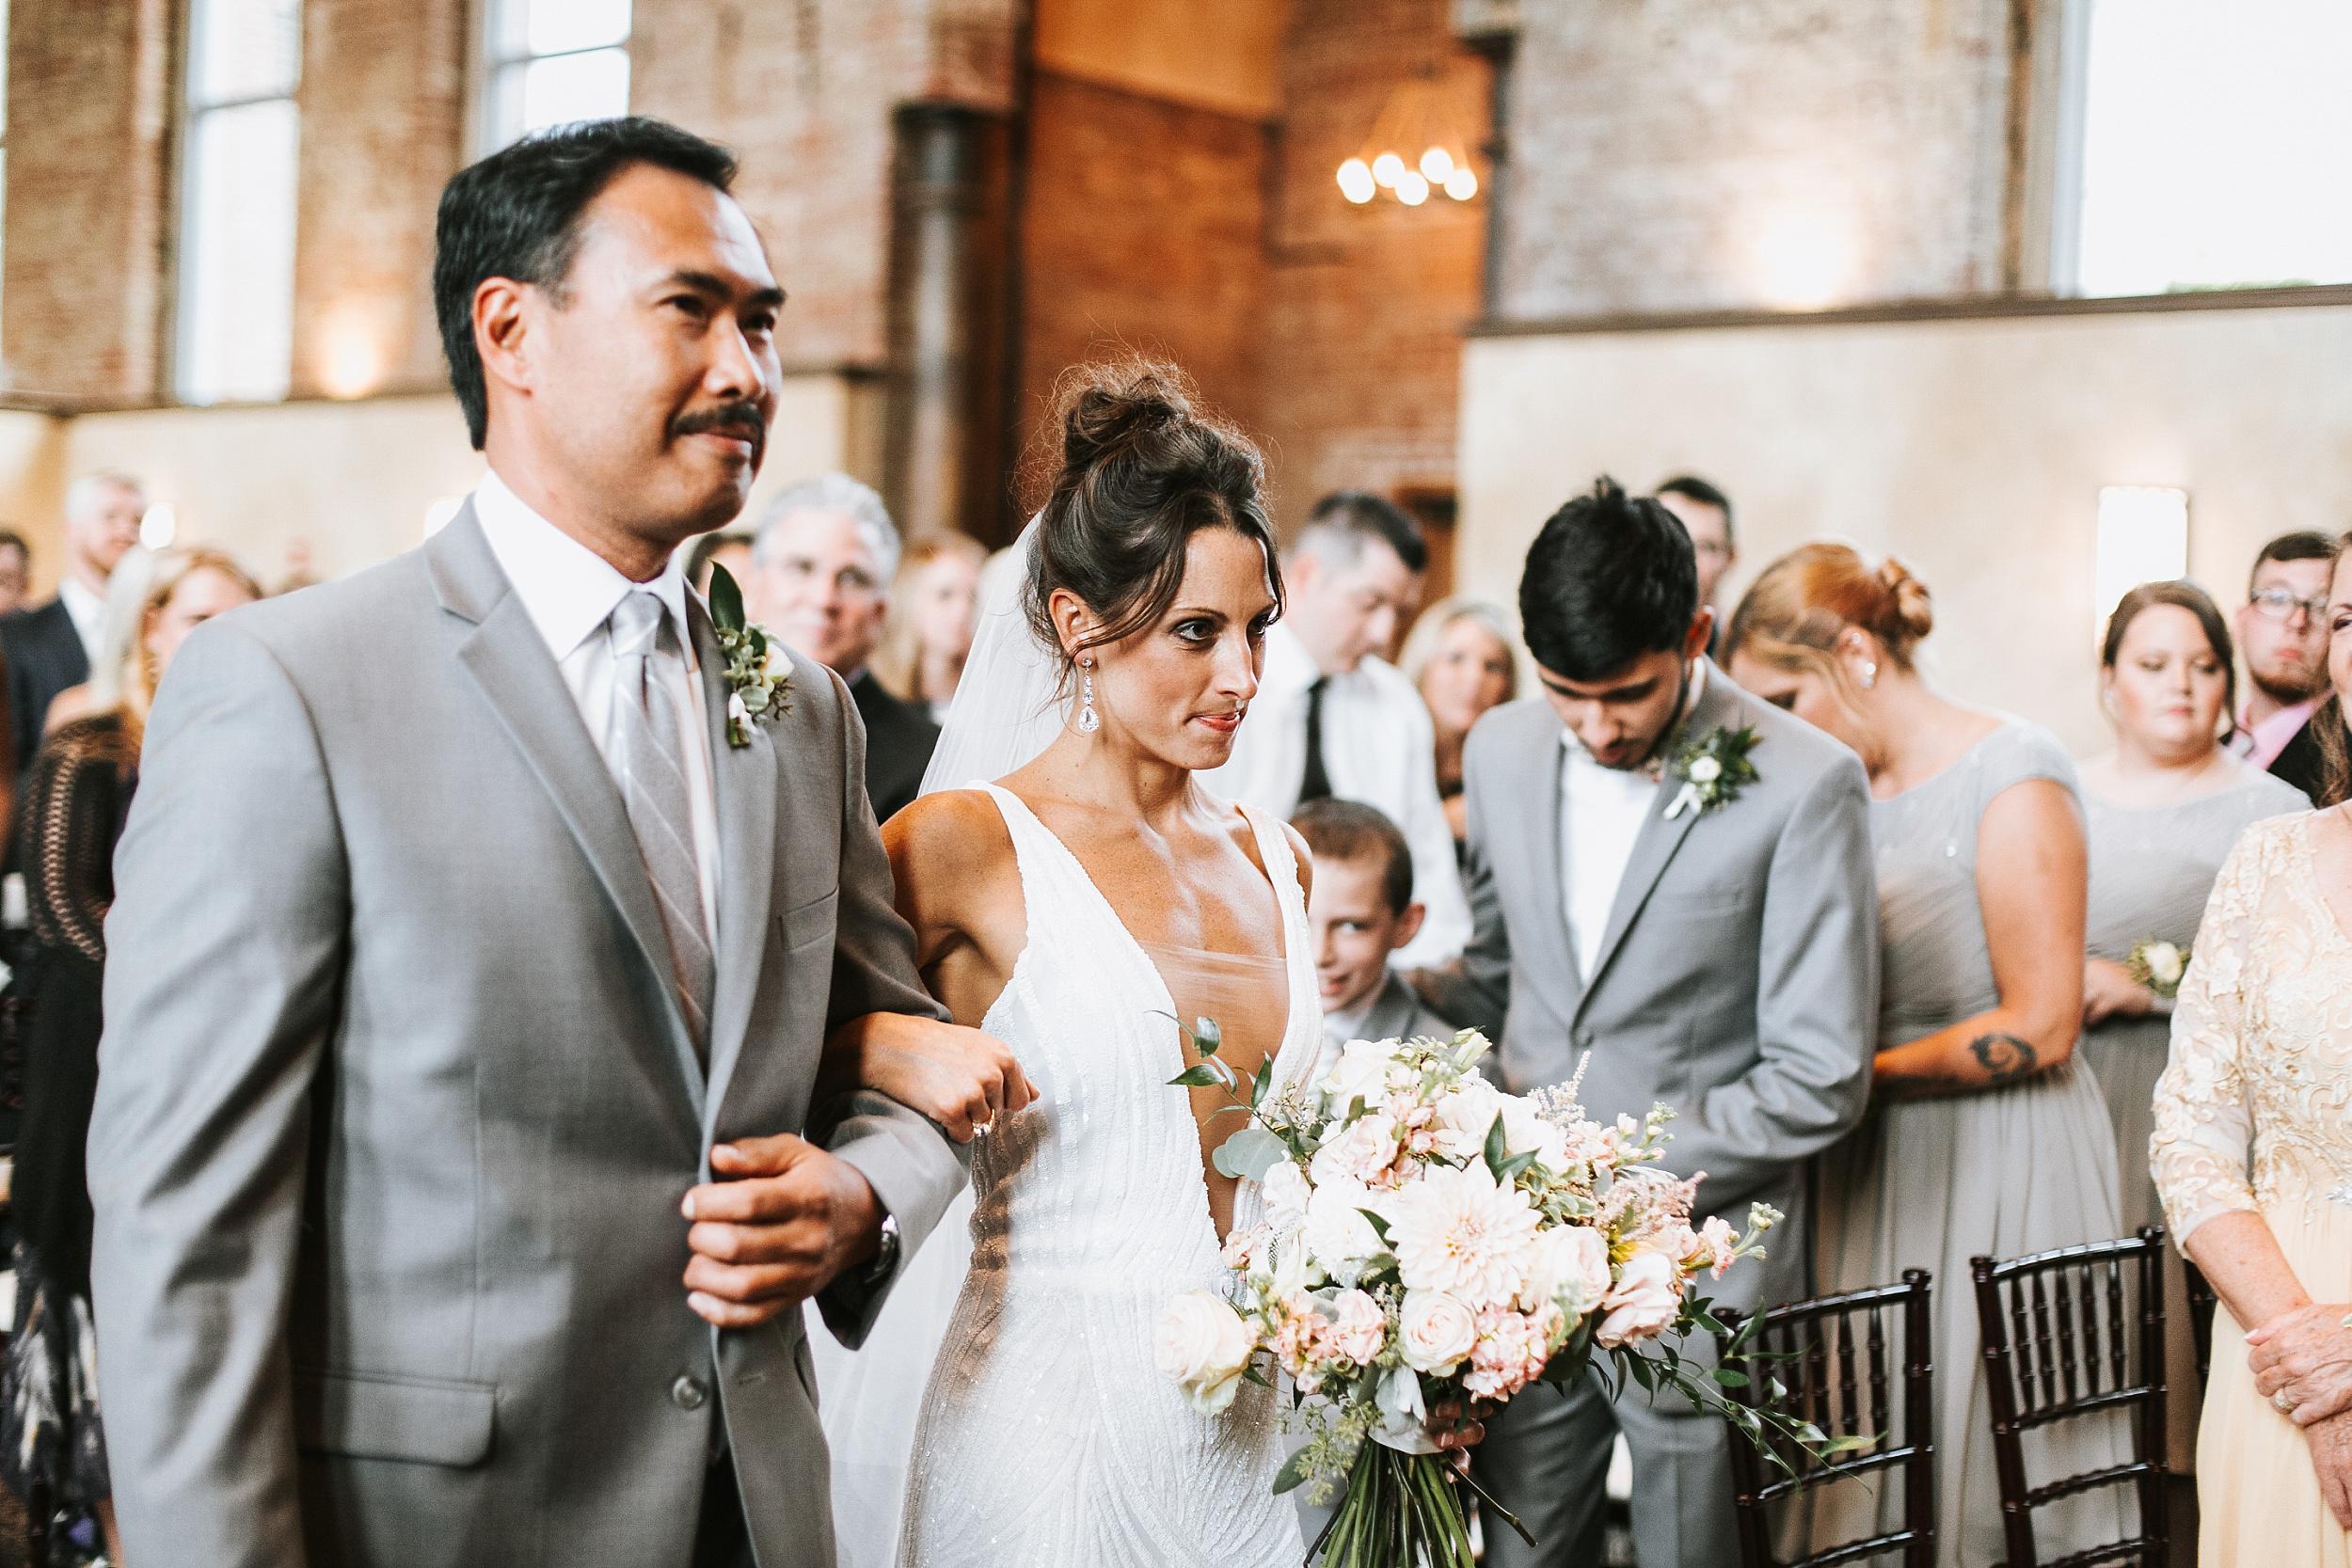 Brooke Townsend Photography - Cincinnati Wedding Photographer (111 of 170).jpg